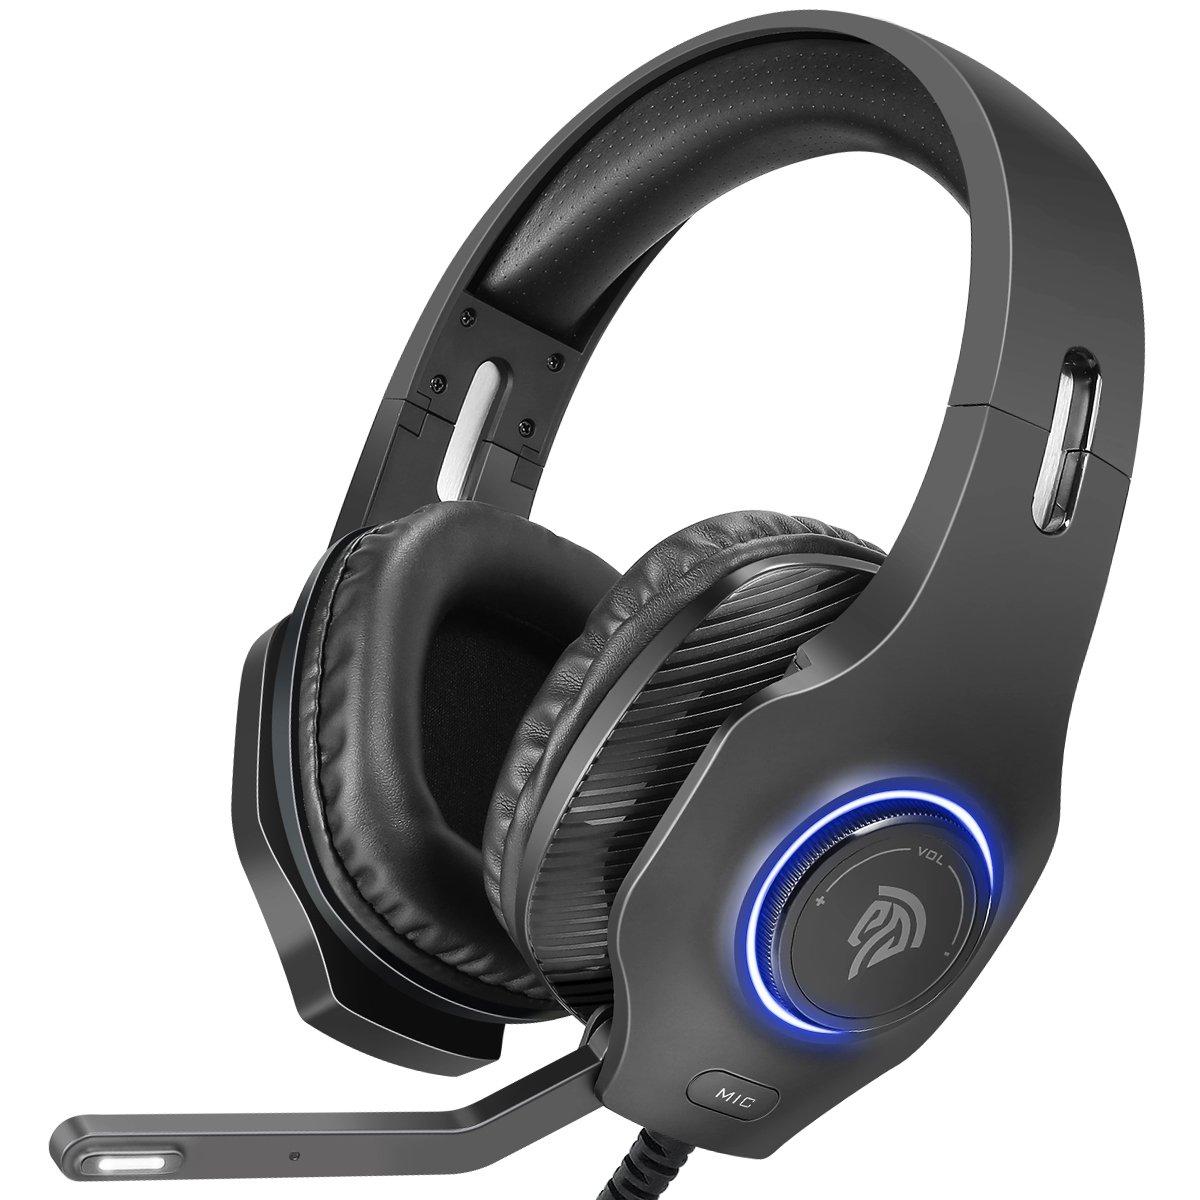 VIP002S RGB Gaming Headset / Kopfhörer für PC/PS4/Xbox One